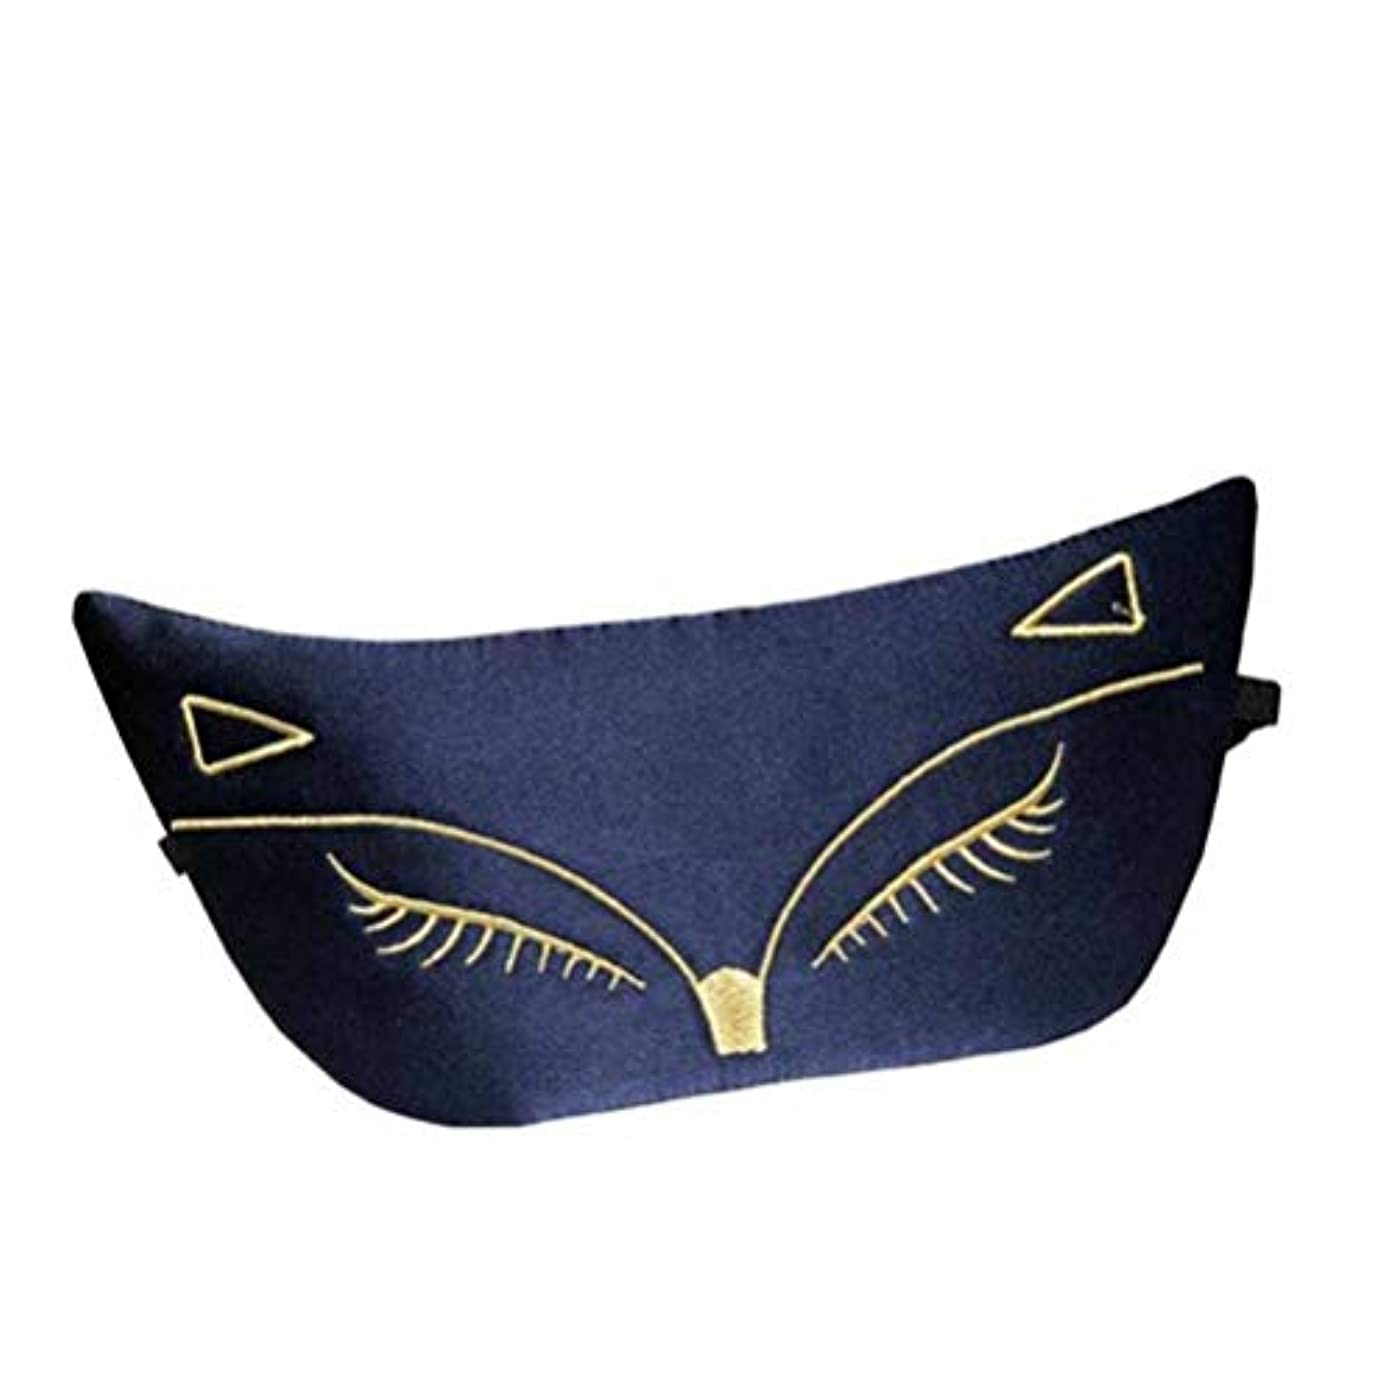 SUPVOX シルクスリープアイマスクサンシェードカバー刺繍キツネパターンアイパッチ女性用快適(ダークブルー)